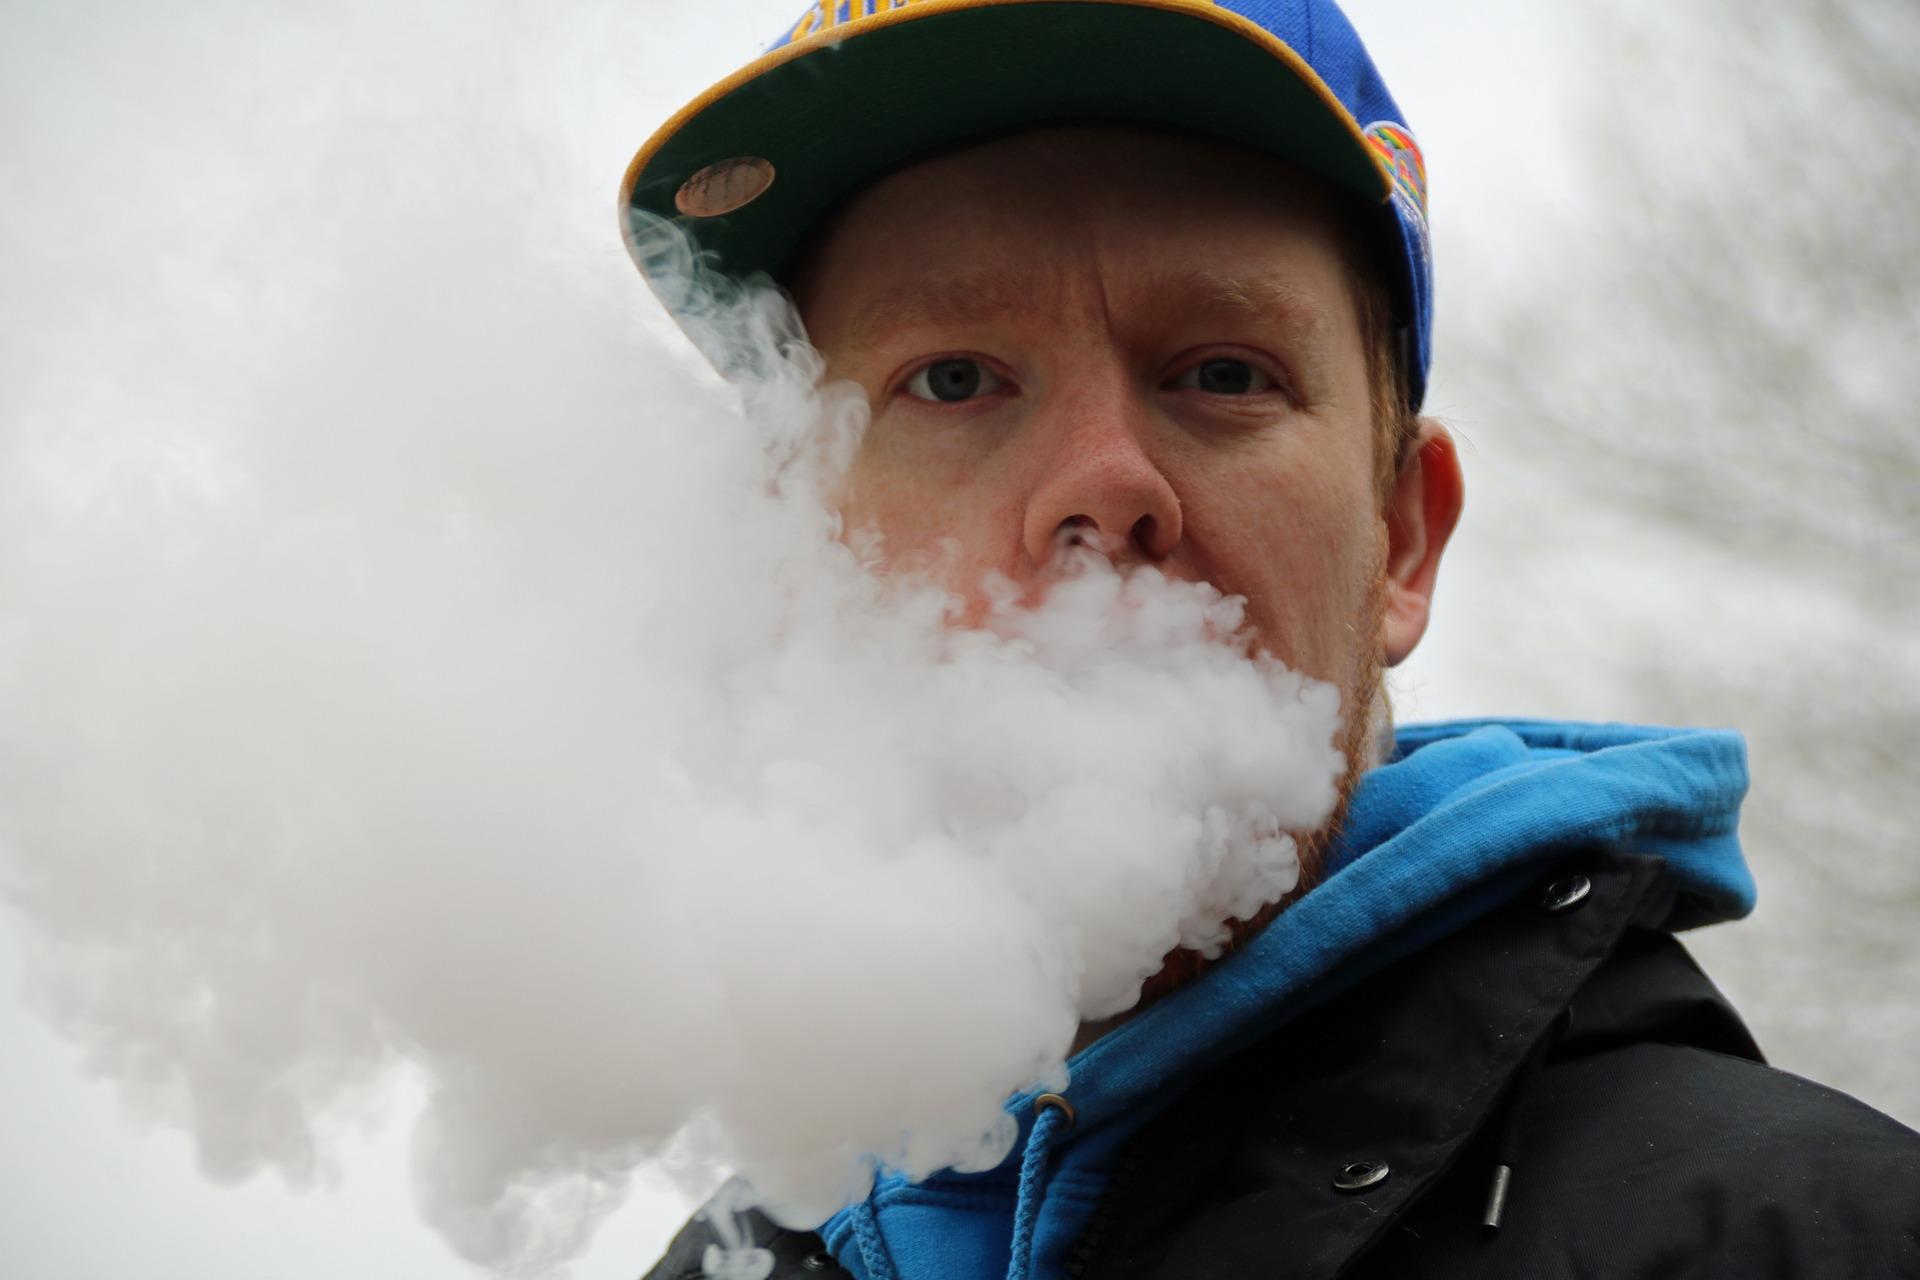 How Australia's Ban on Nicotine Vape Spawned a Thriving Black Market